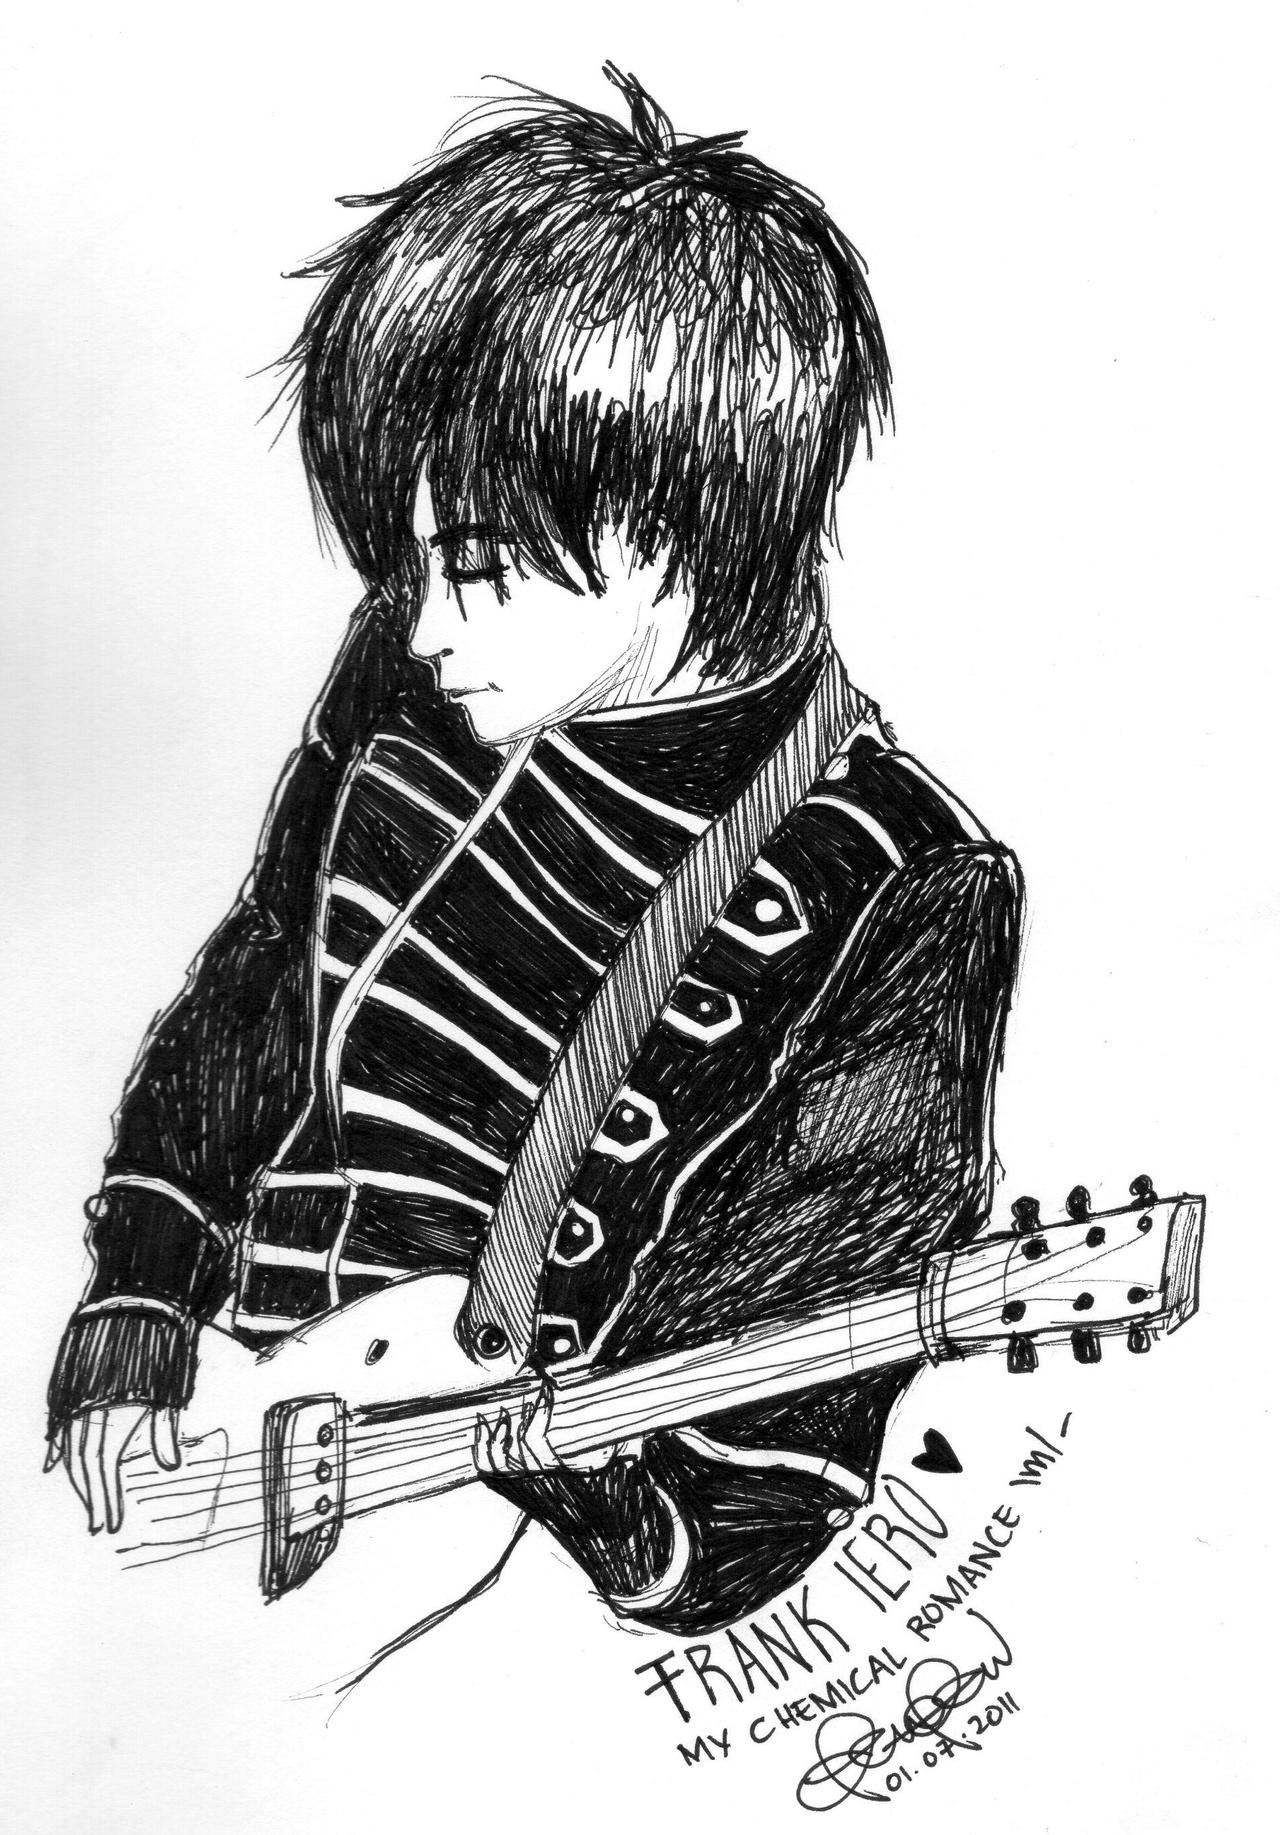 Frankin' Rockin' by 12AutumnPromise18